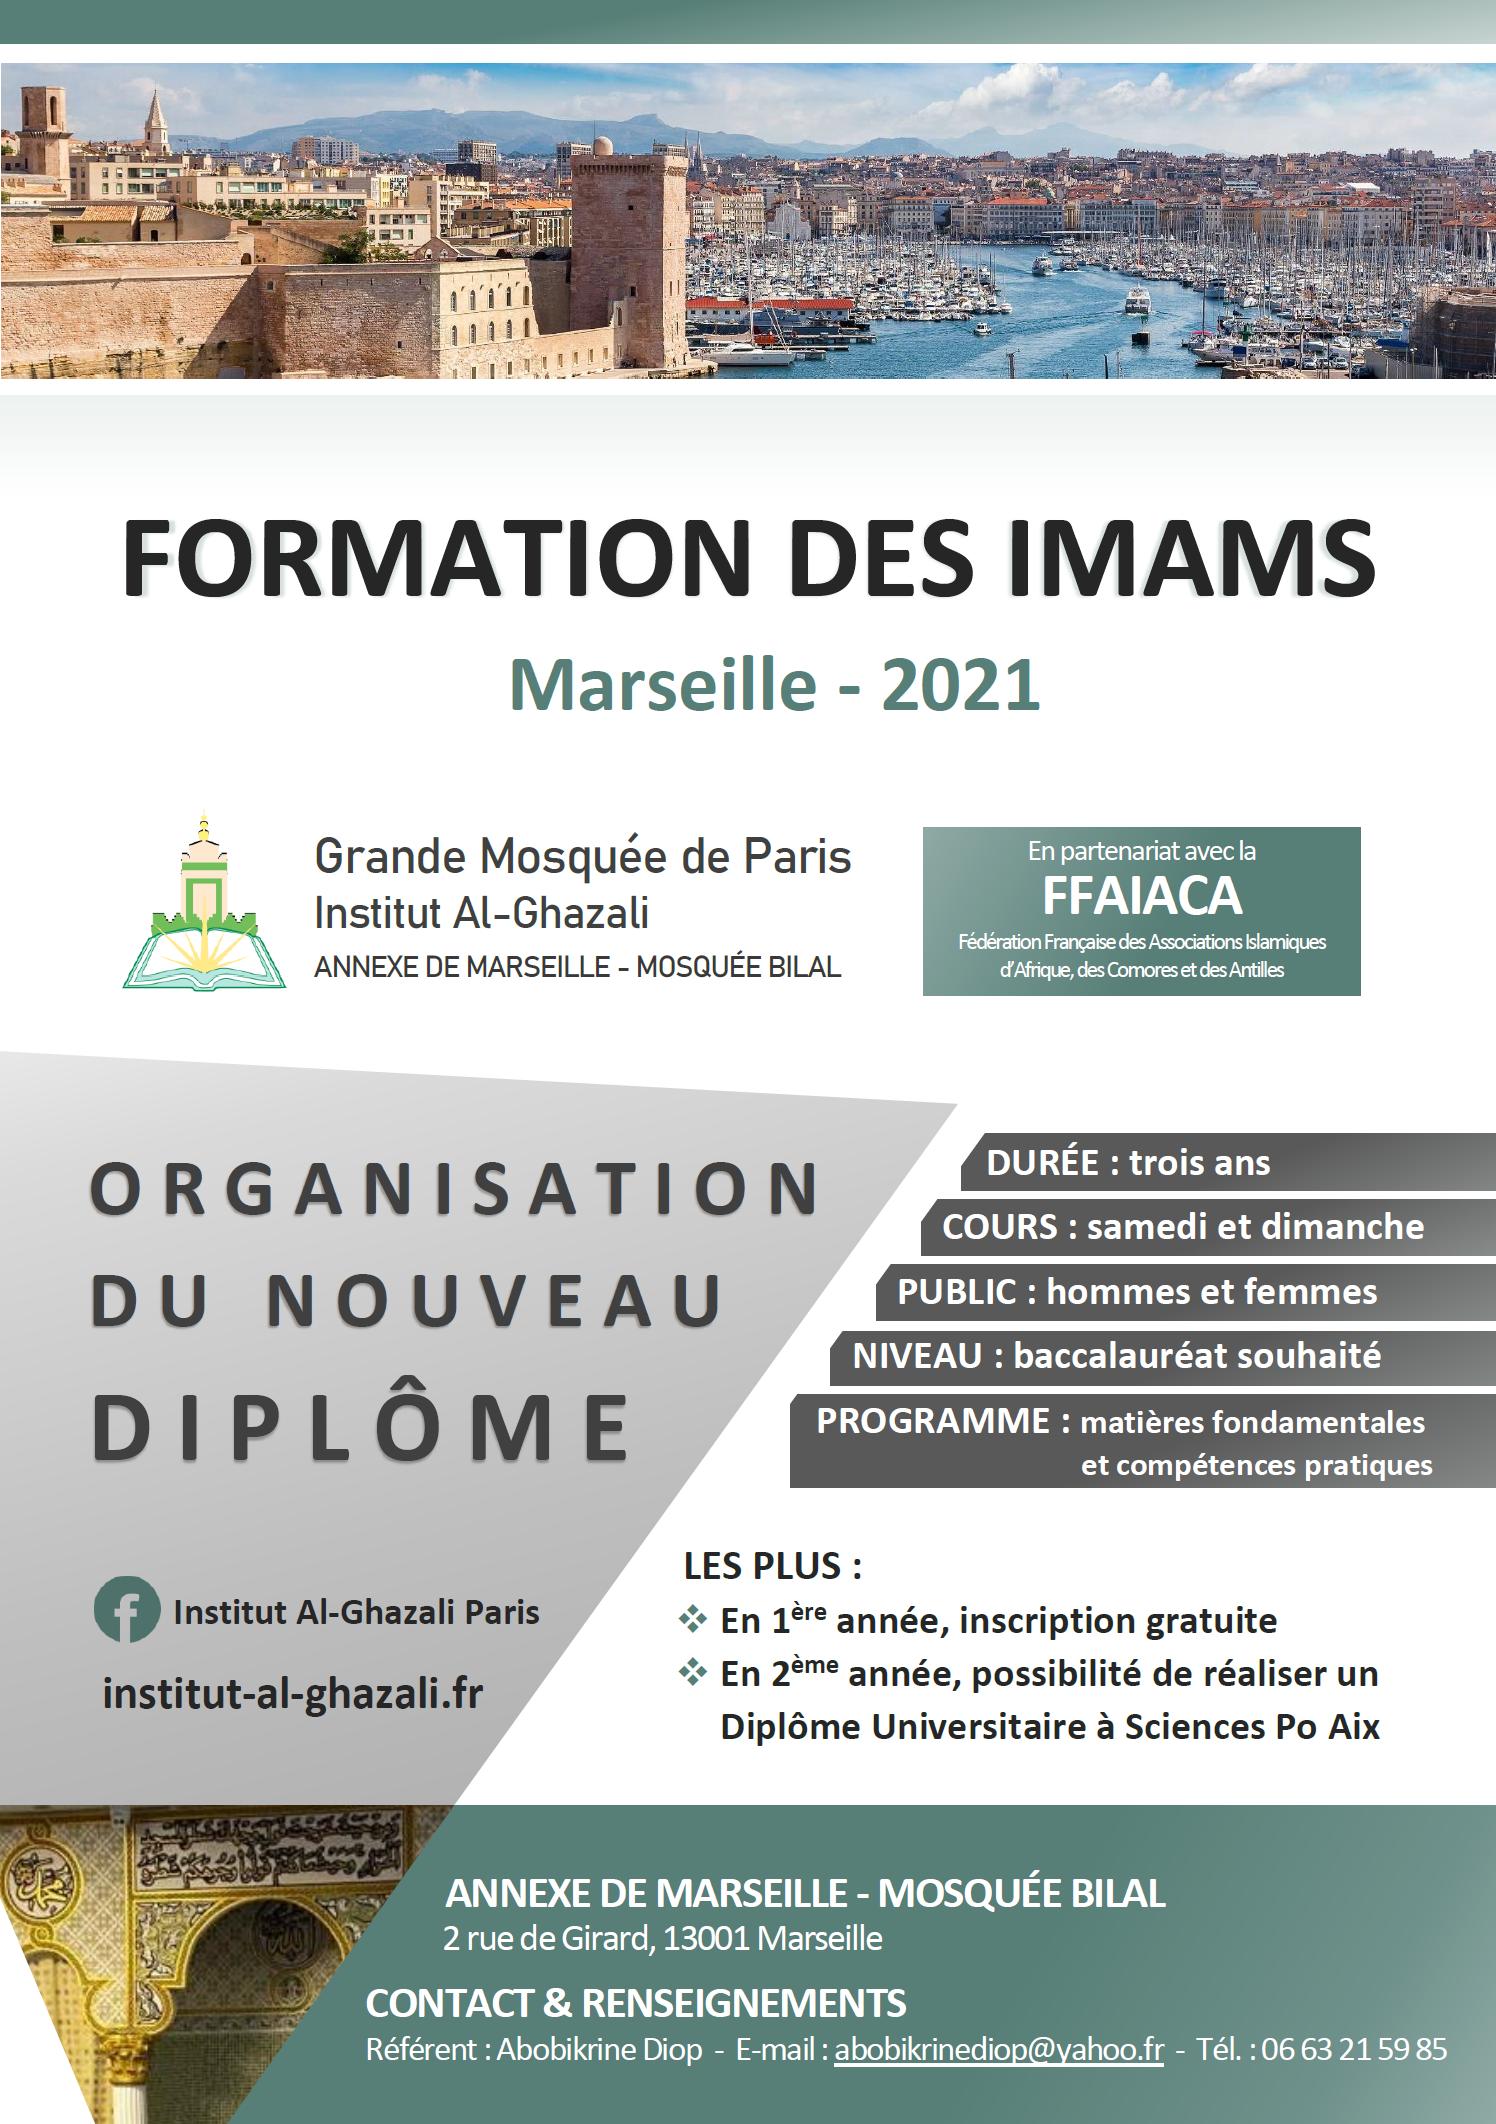 Formation des Imams Al-Ghazali - Présentation - Marseille